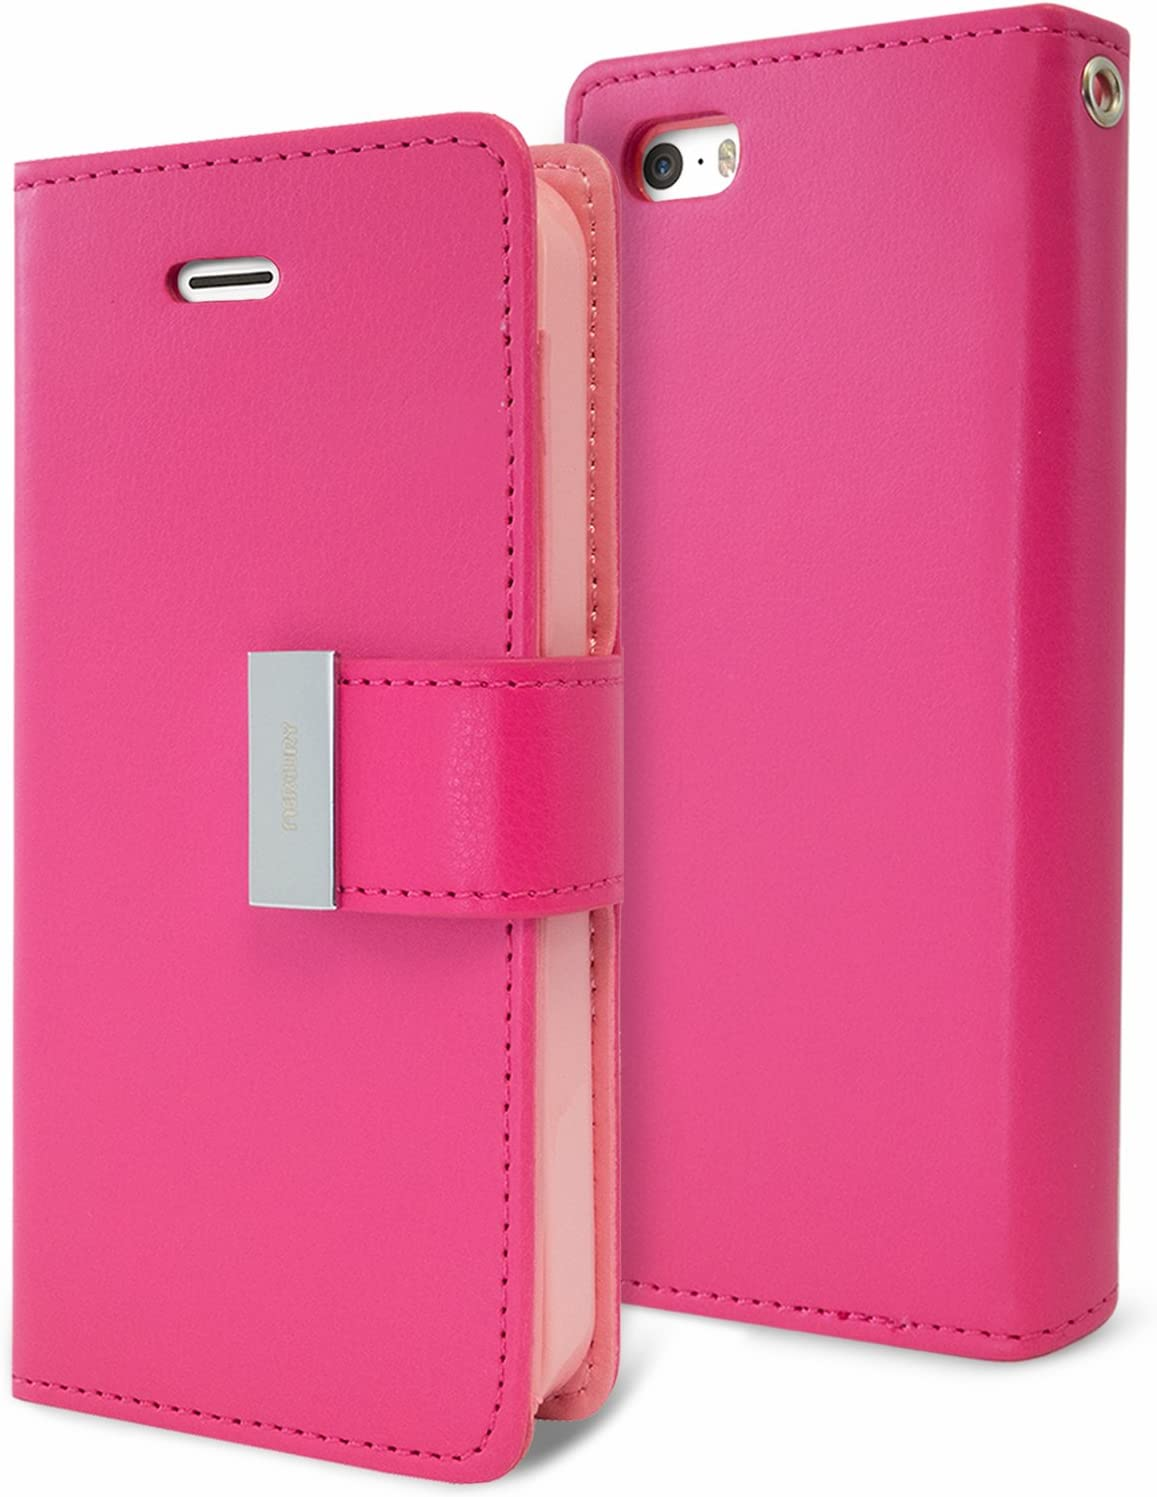 Goospery Rich Wallet for Apple iPhone SE Case (2016) iPhone 5S Case (2013) iPhone 5 Case (2012) Extra Card Slots Leather Flip Cover (Hot Pink) IP5-RIC-HPNK